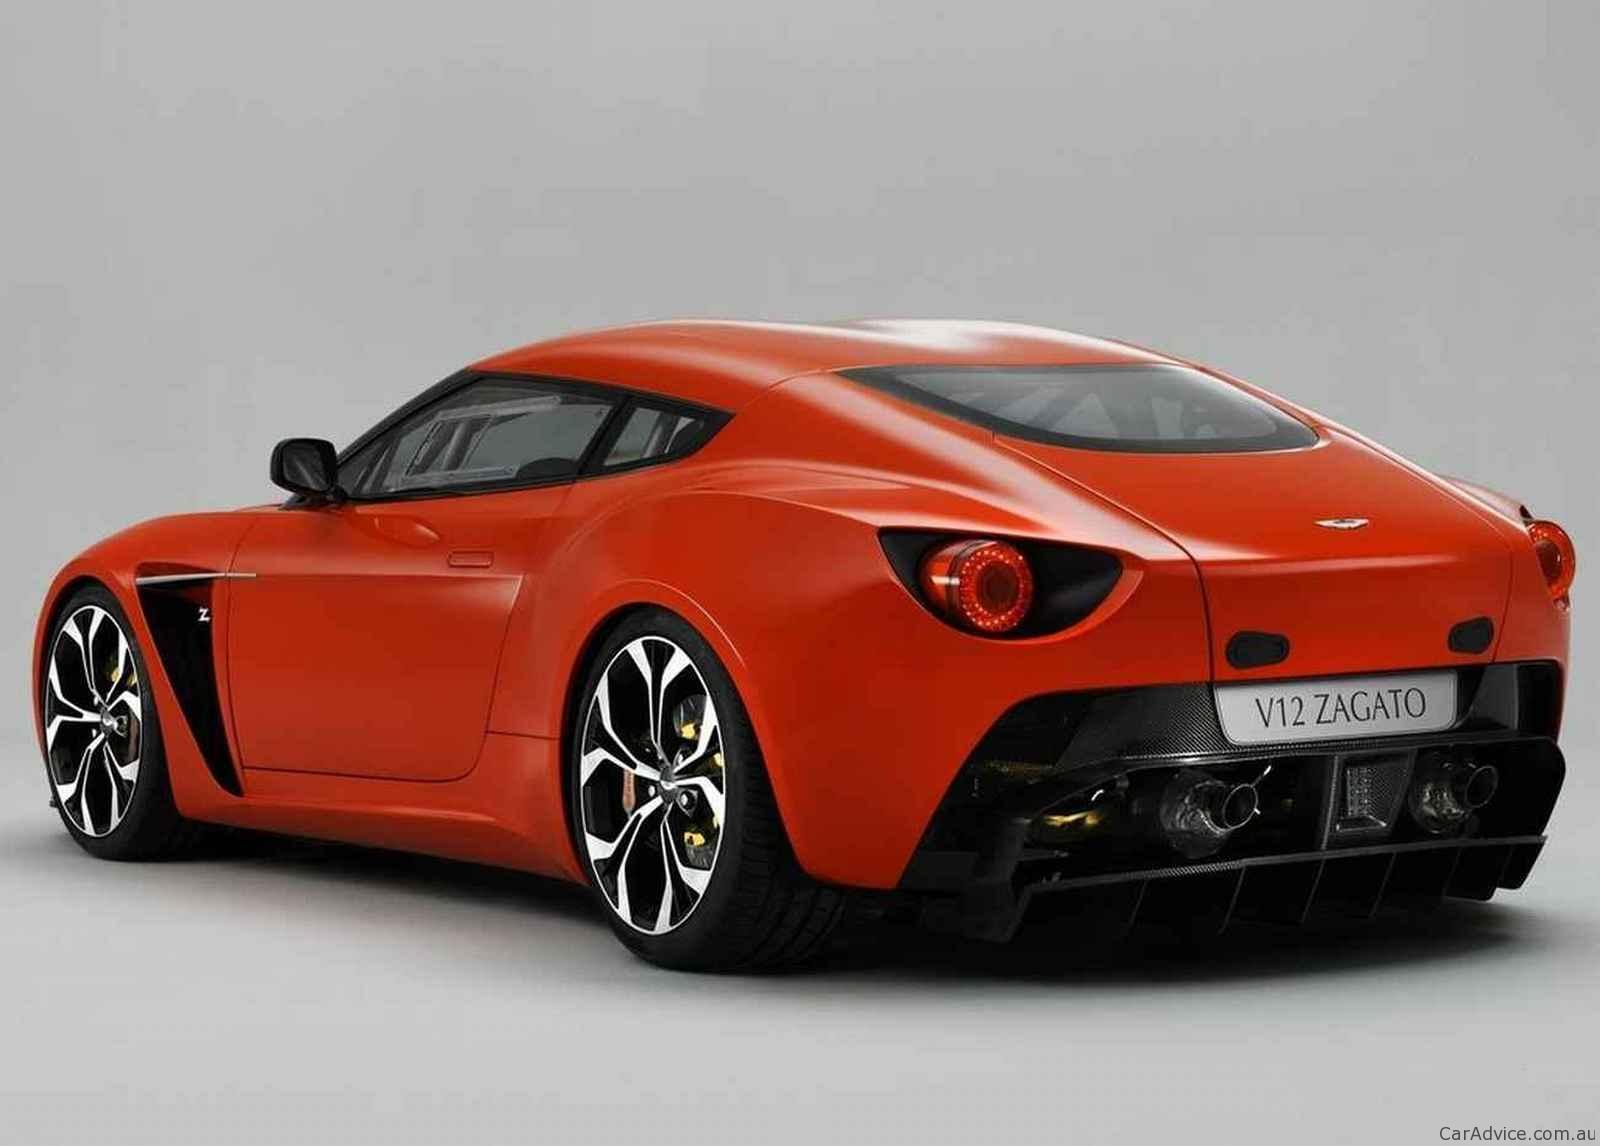 Aston Martin Secures Funding For Allnew Models Photos CarAdvice - Aston martin models